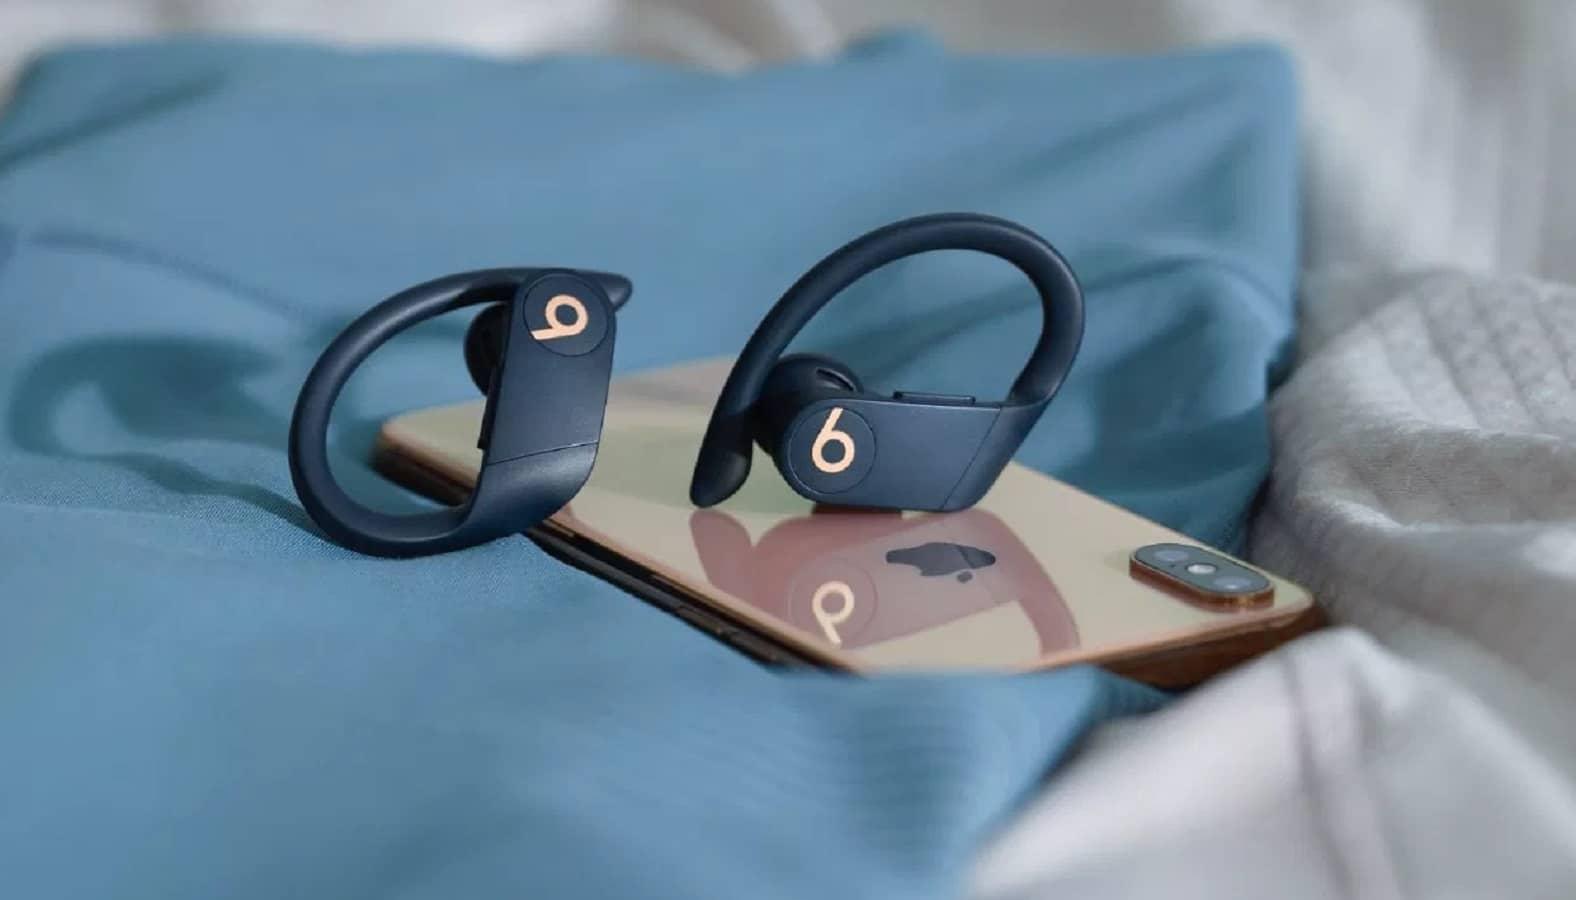 powerbeats pro beats wireless headphones sitting on iphone